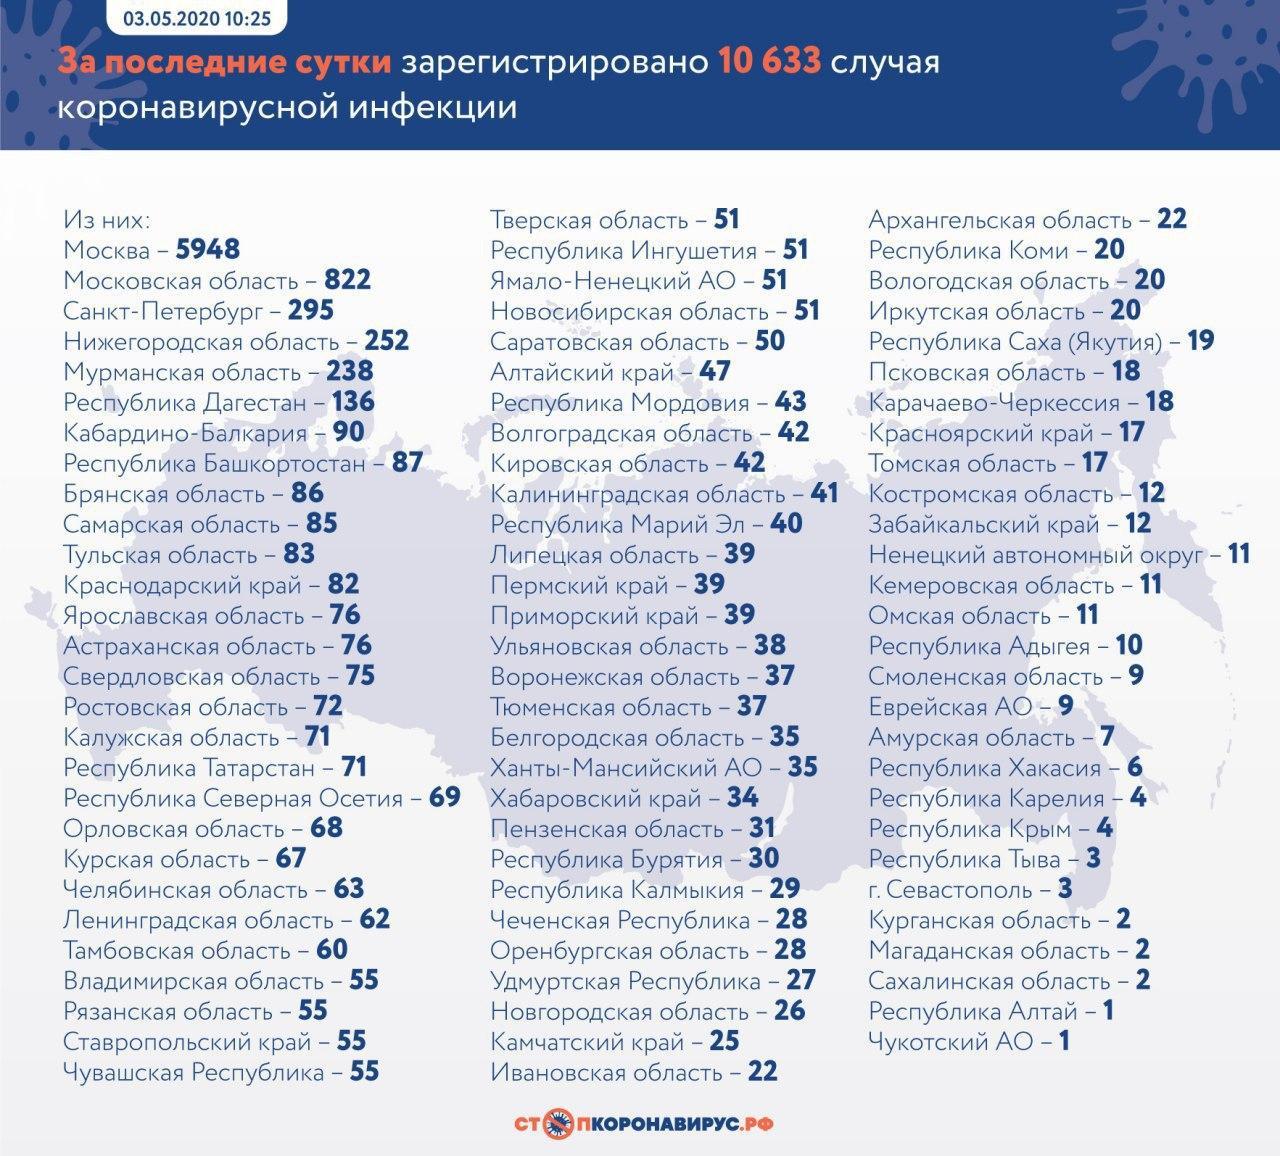 Коронавирус в России: статистика на 3 мая